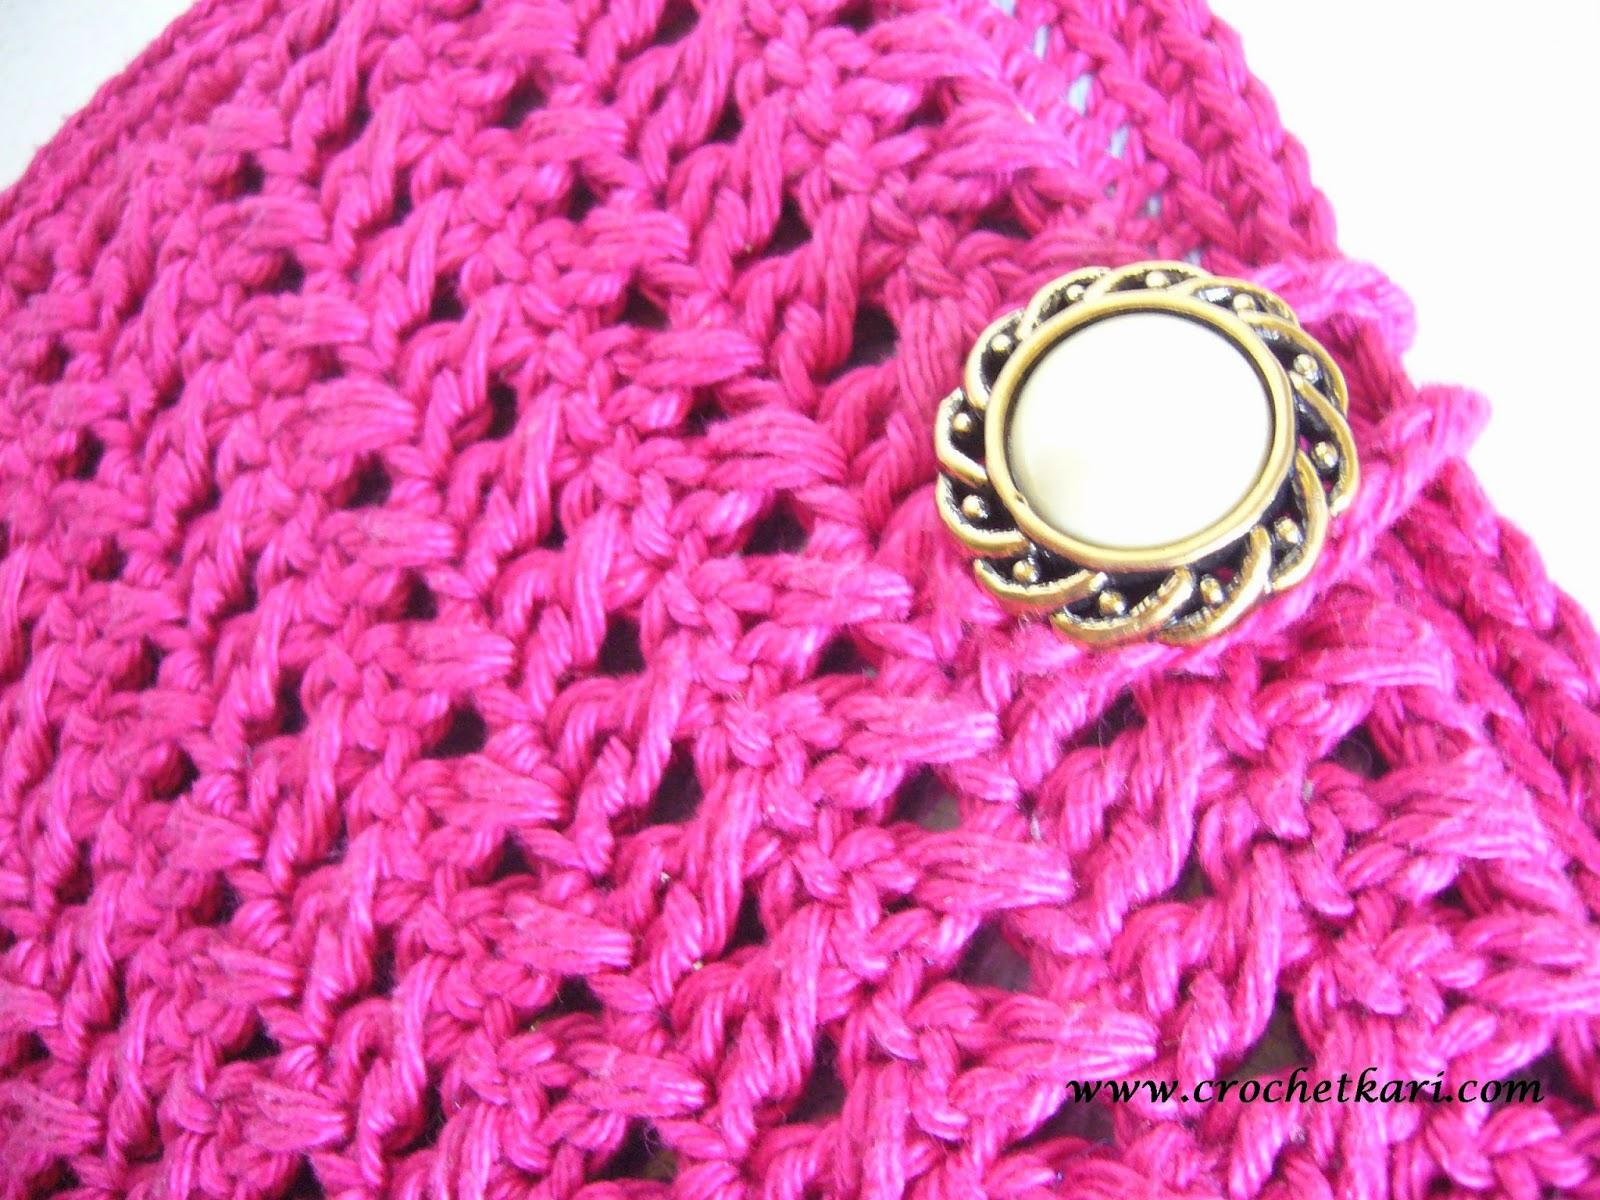 Priscilla aluminum crochet hook case